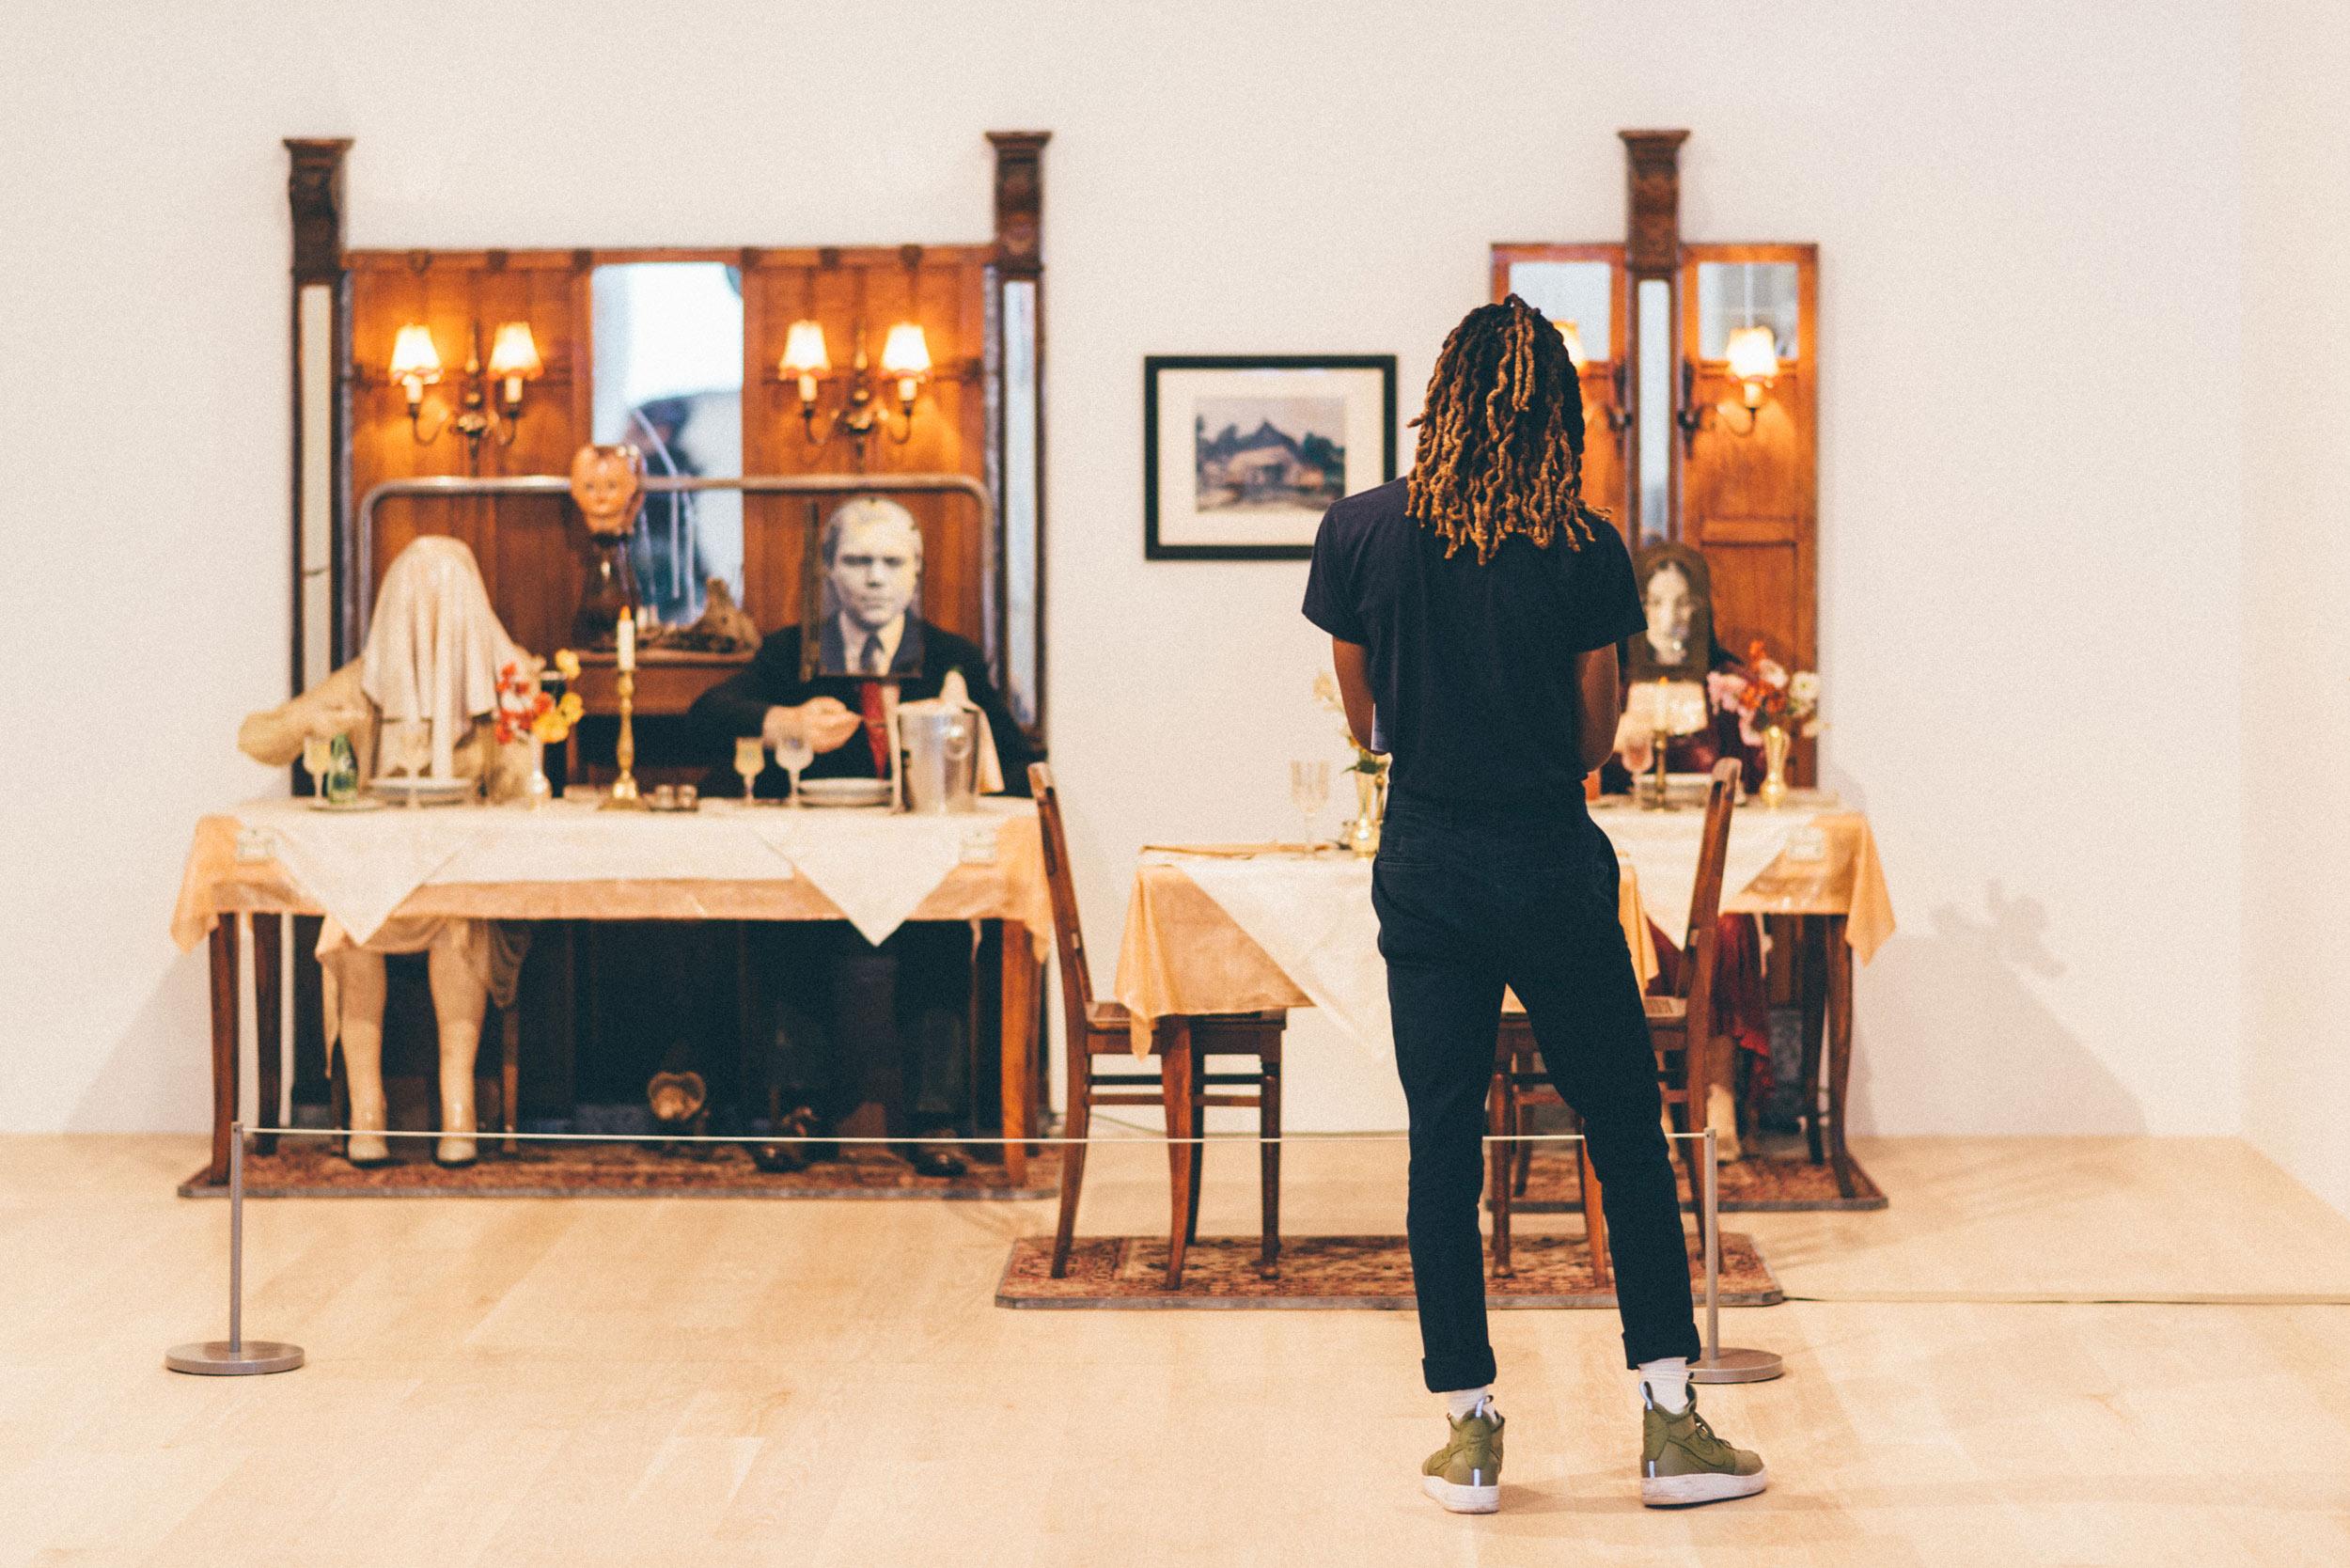 about institute of contemporary art miami